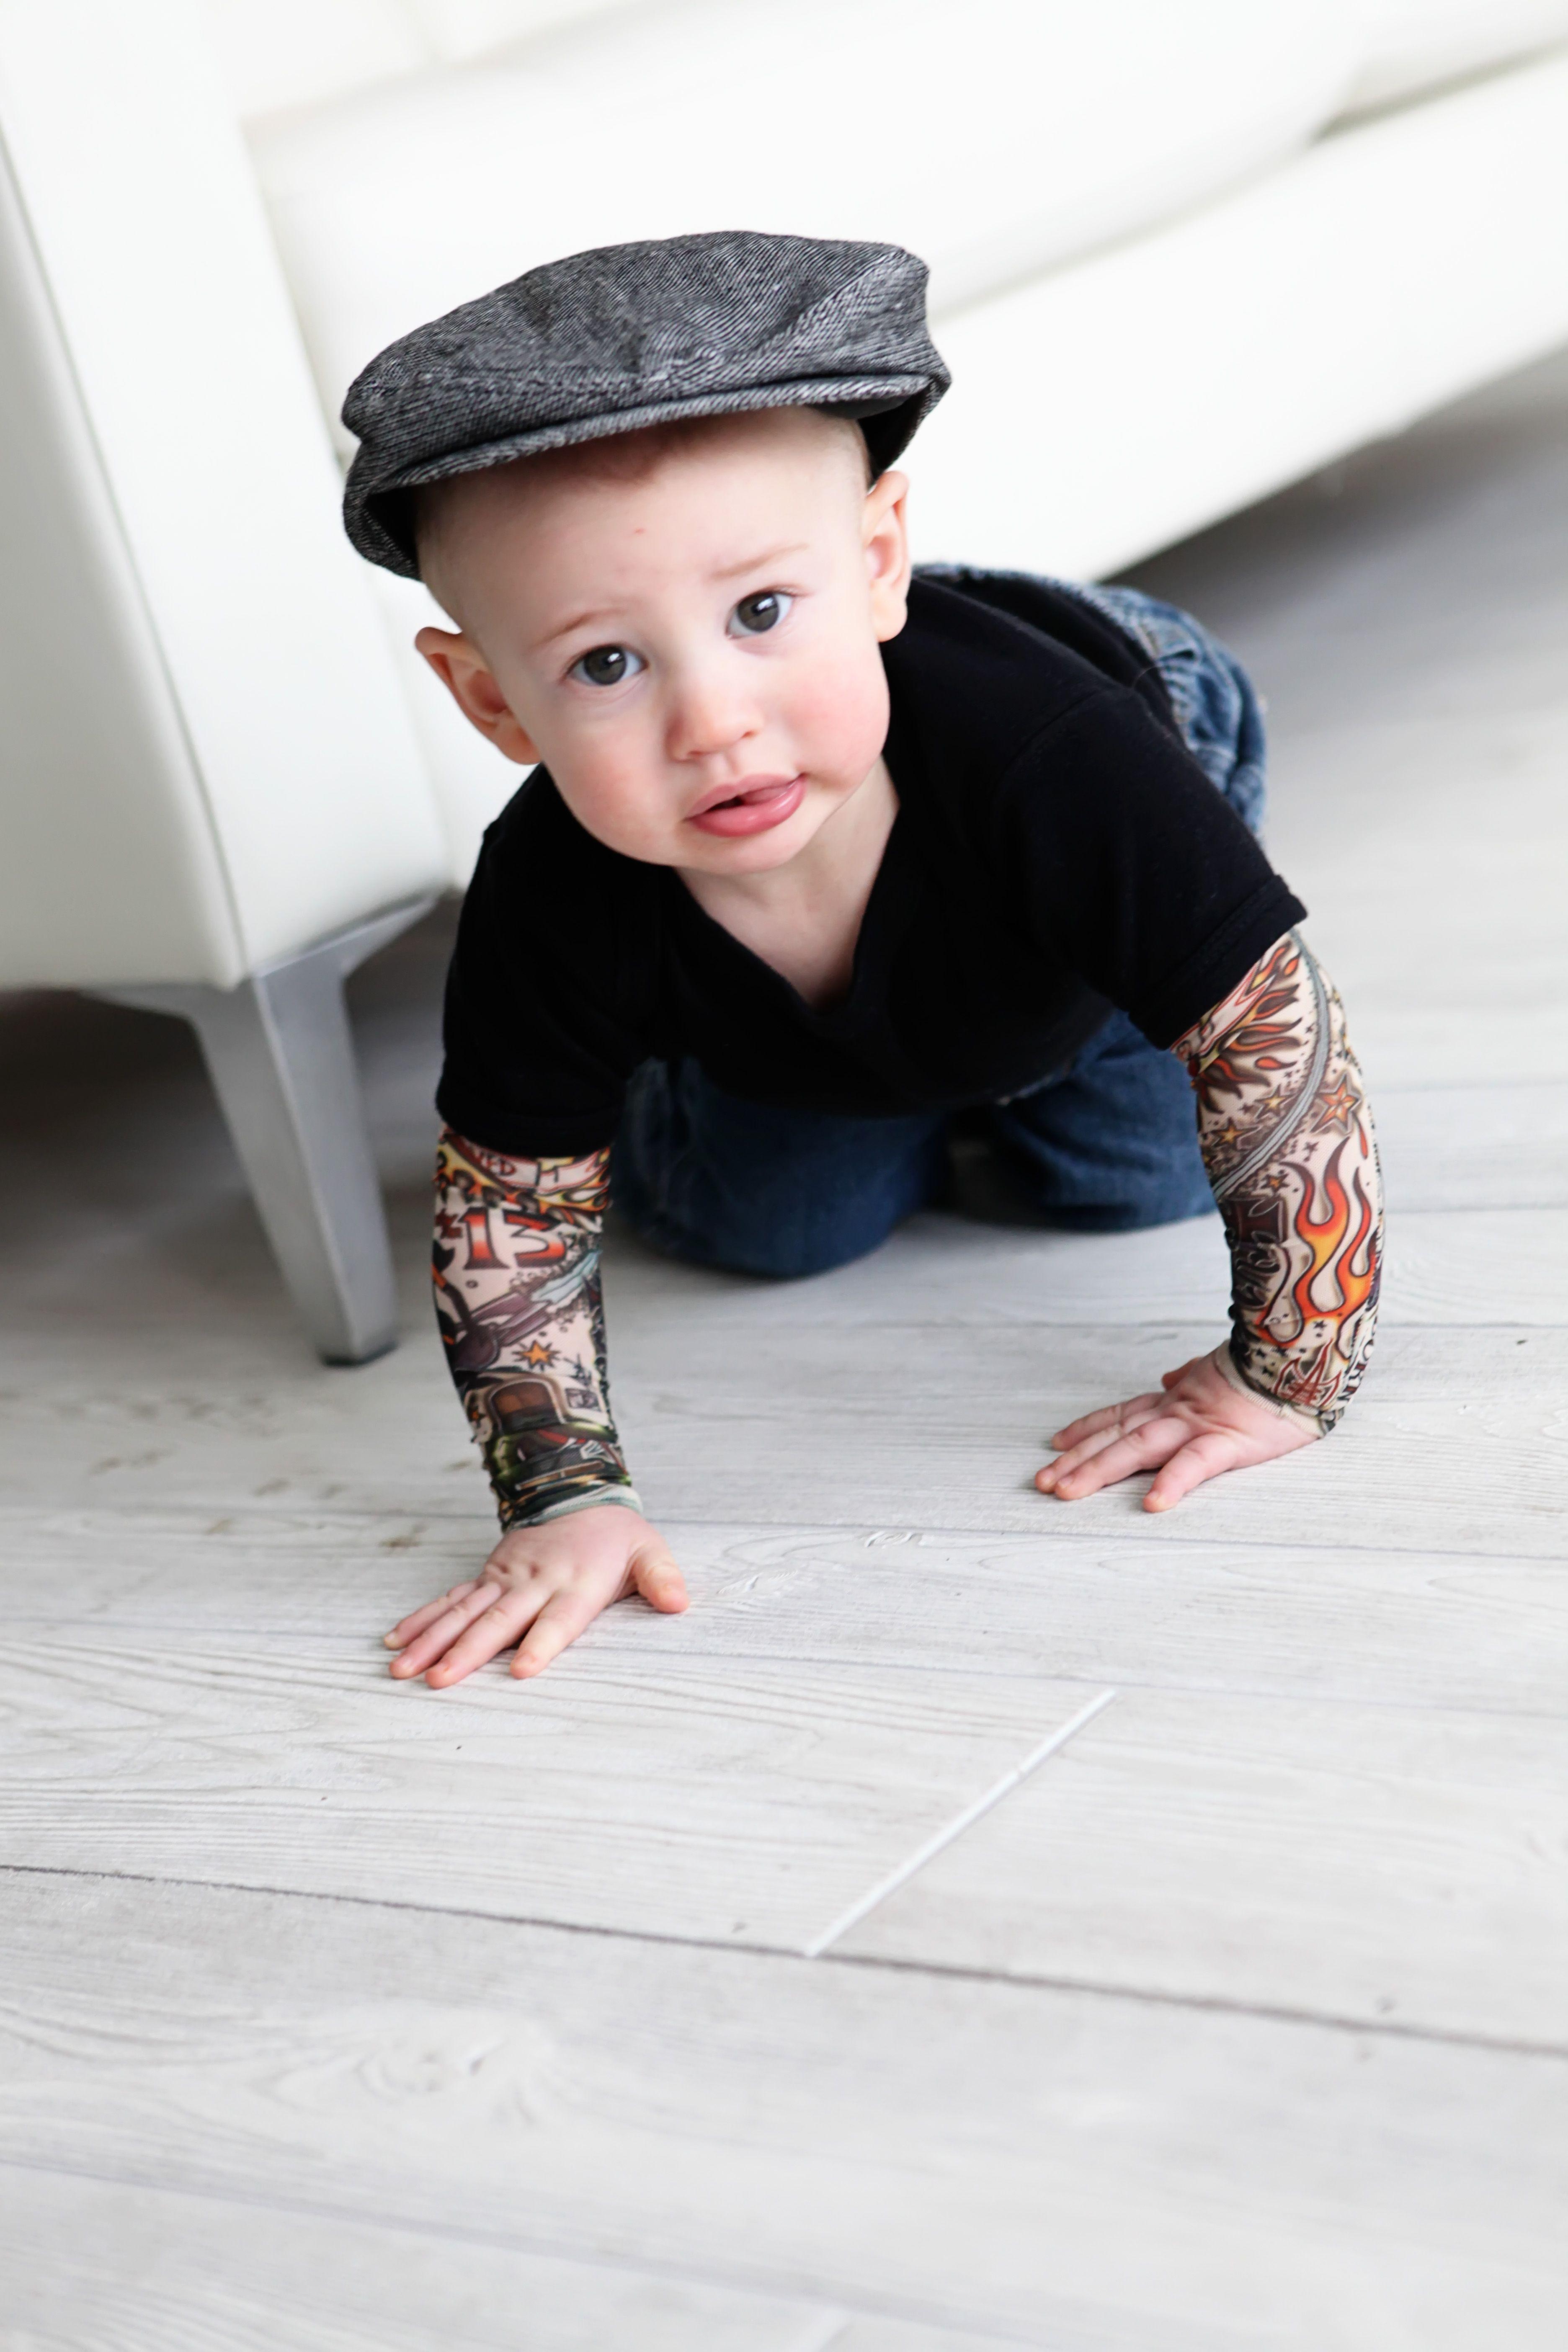 Black Heart breaker tattoo sleeve onesie!! haha Ali if you